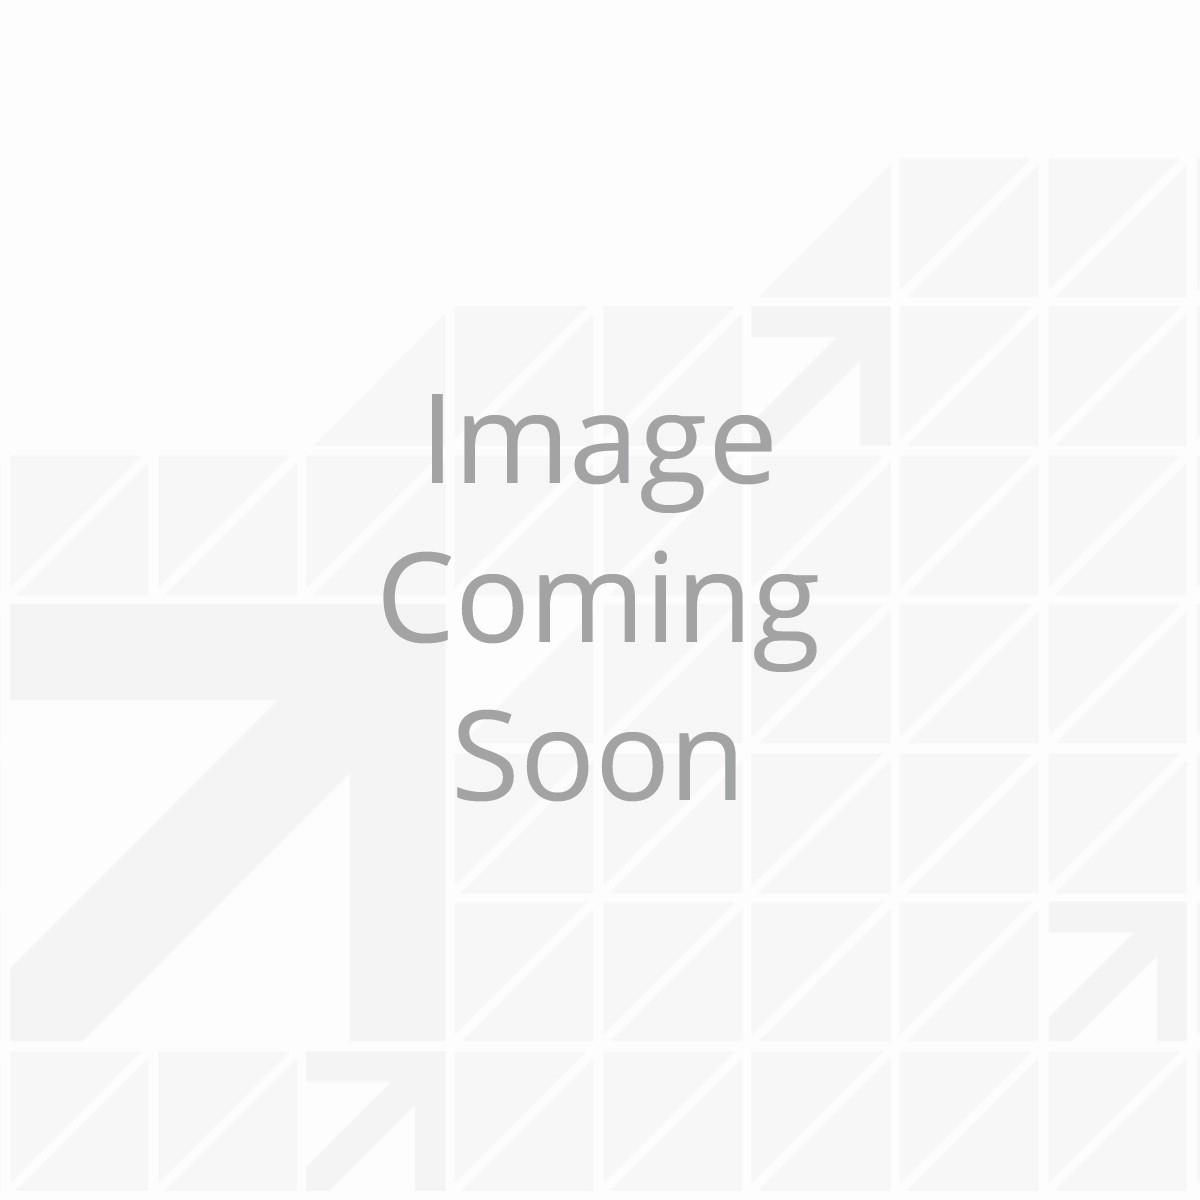 17' Power & Hybrid Awning Roller Assembly - Prepflex Green Fade